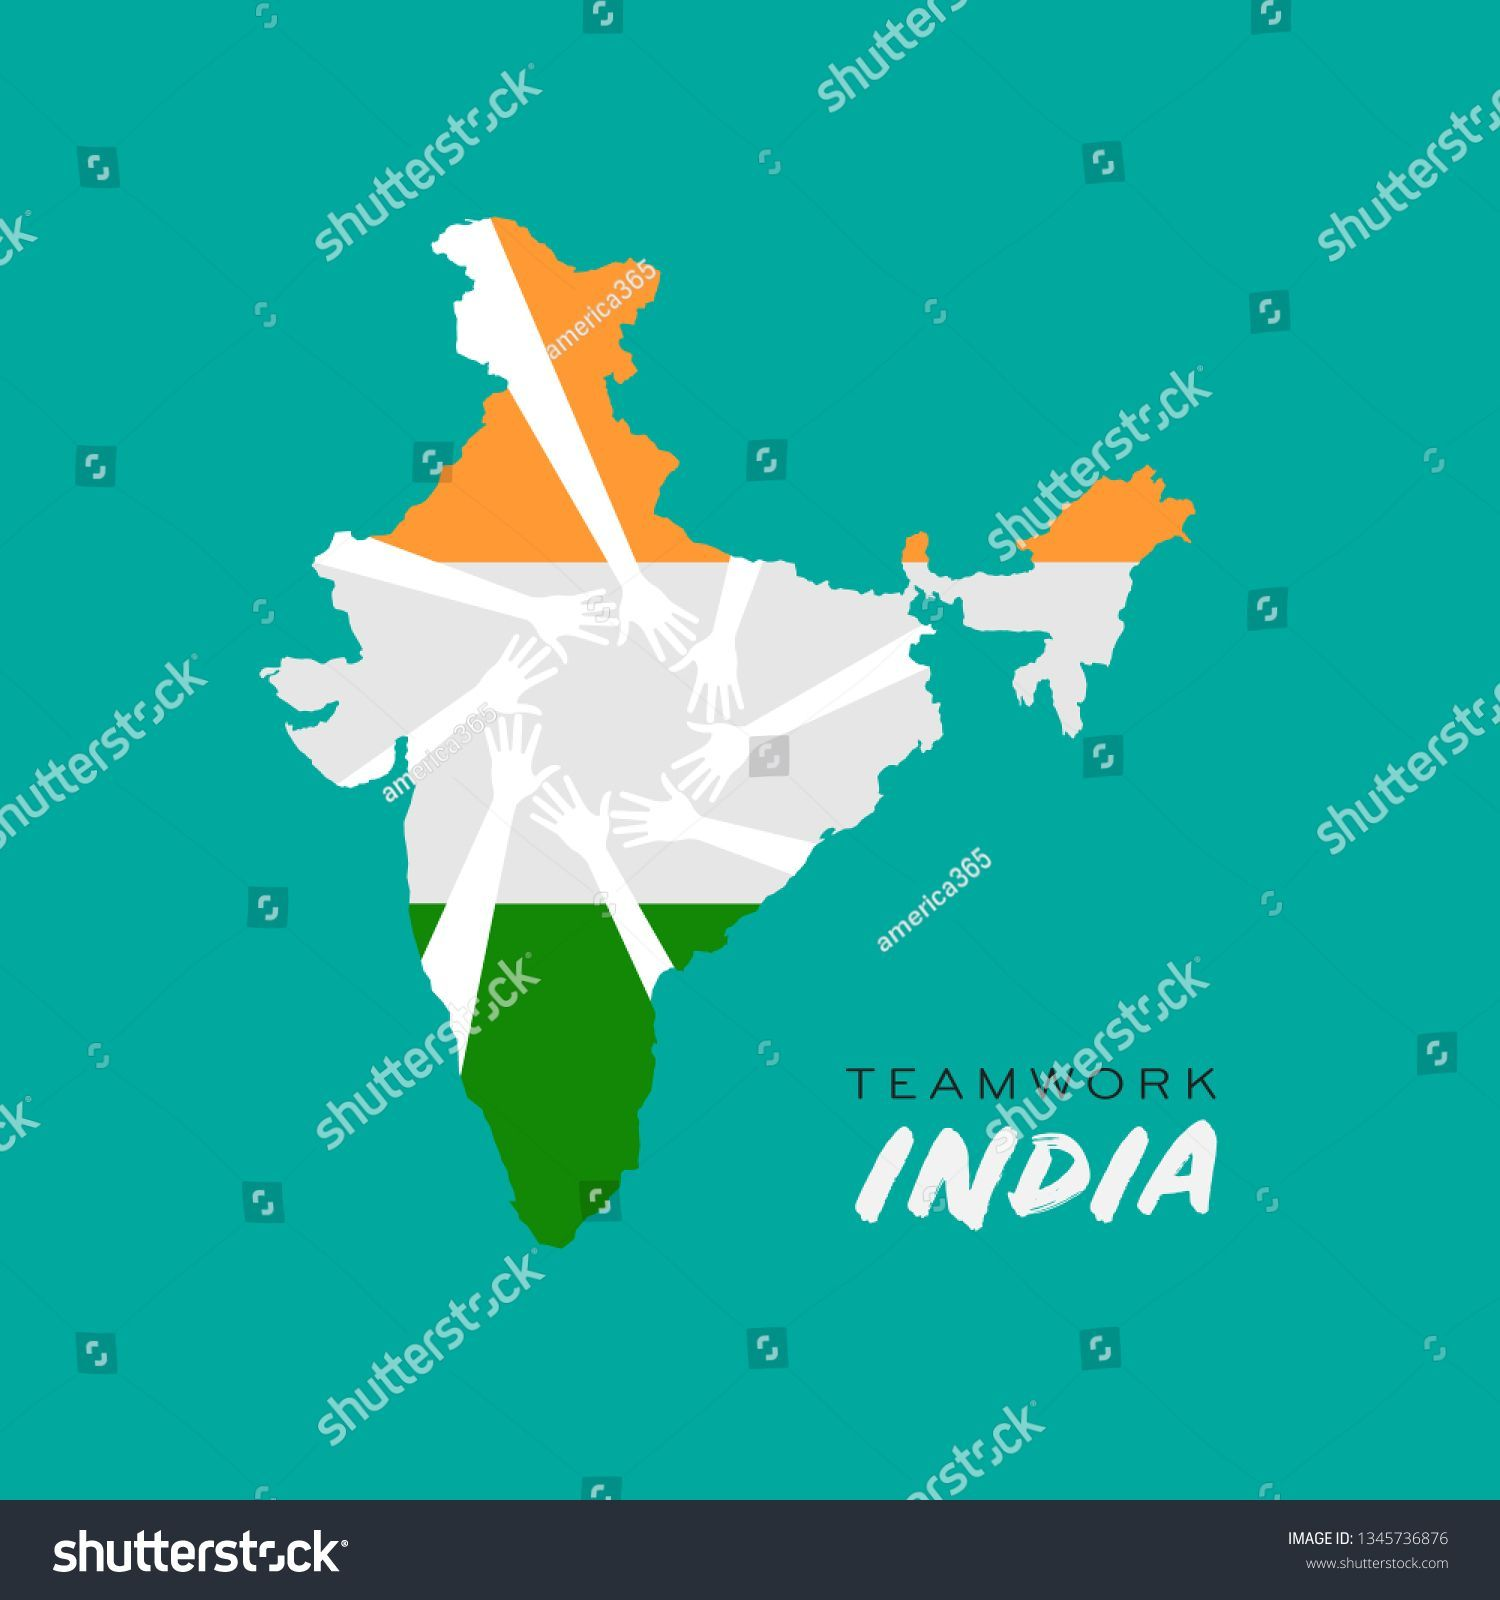 Teamwork Hands in India Map Logo logodesign logo logos